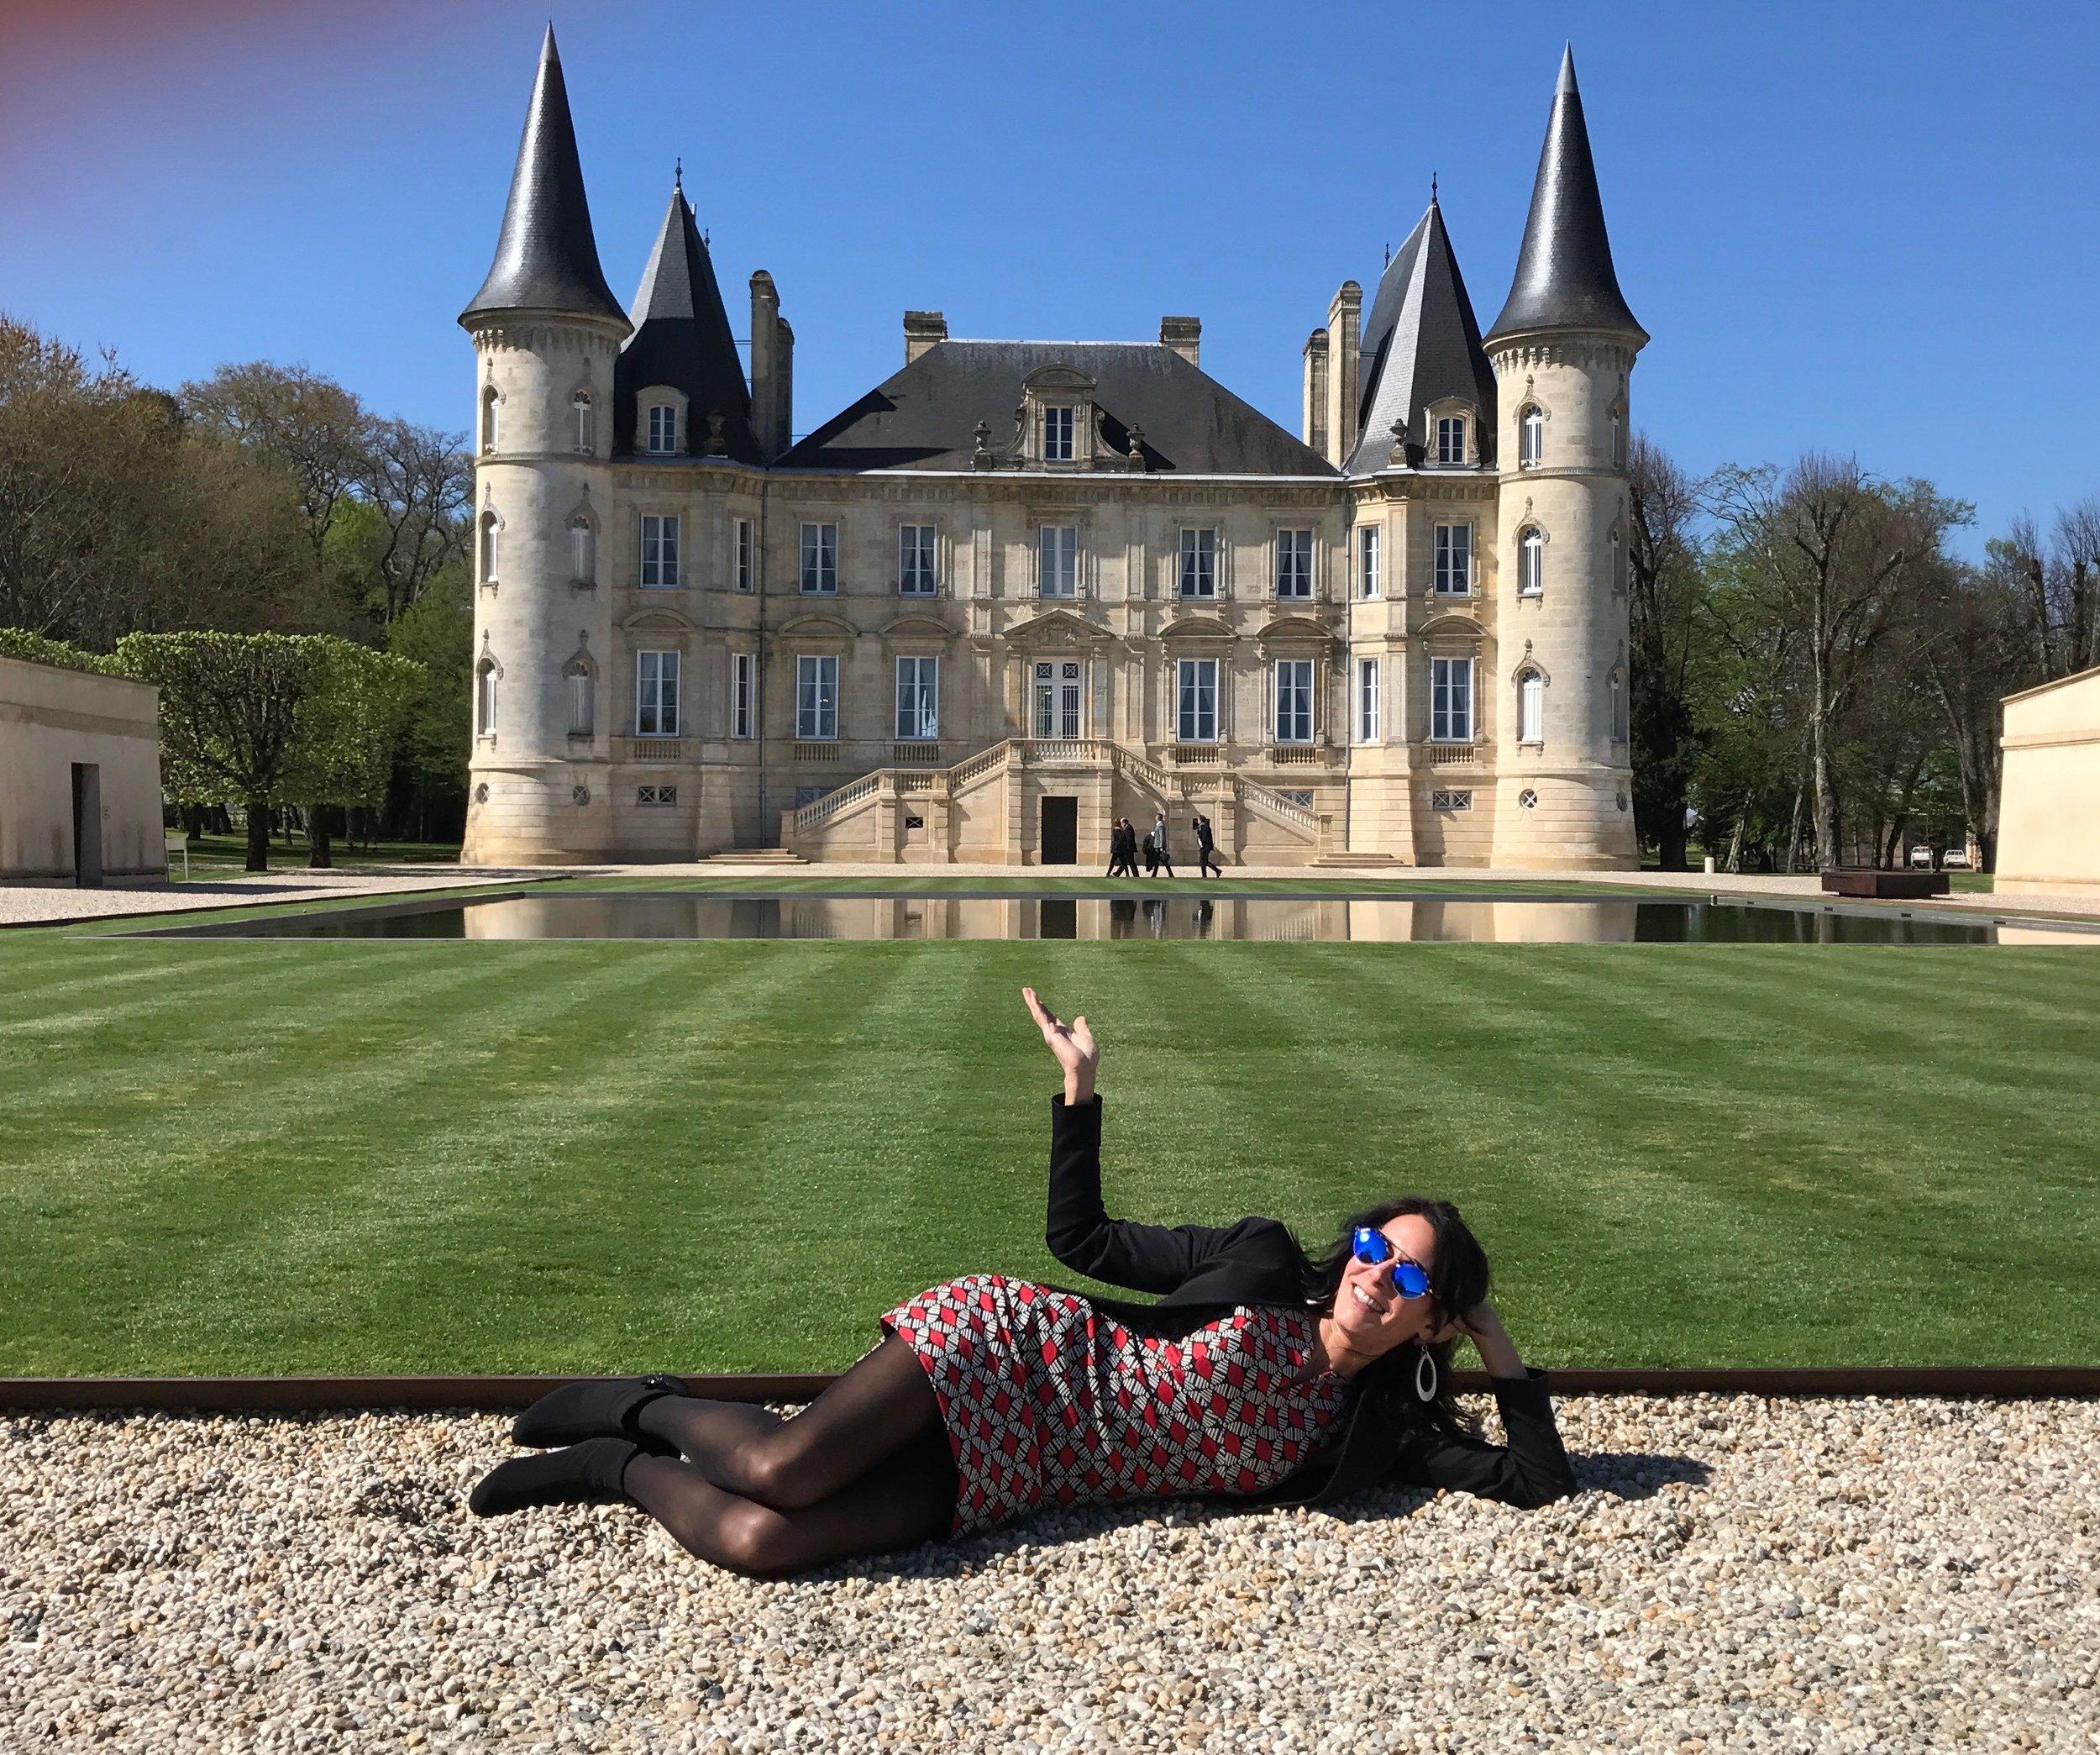 The Wine Chef arrives in Bordeaux! Chateau Pichon Baron